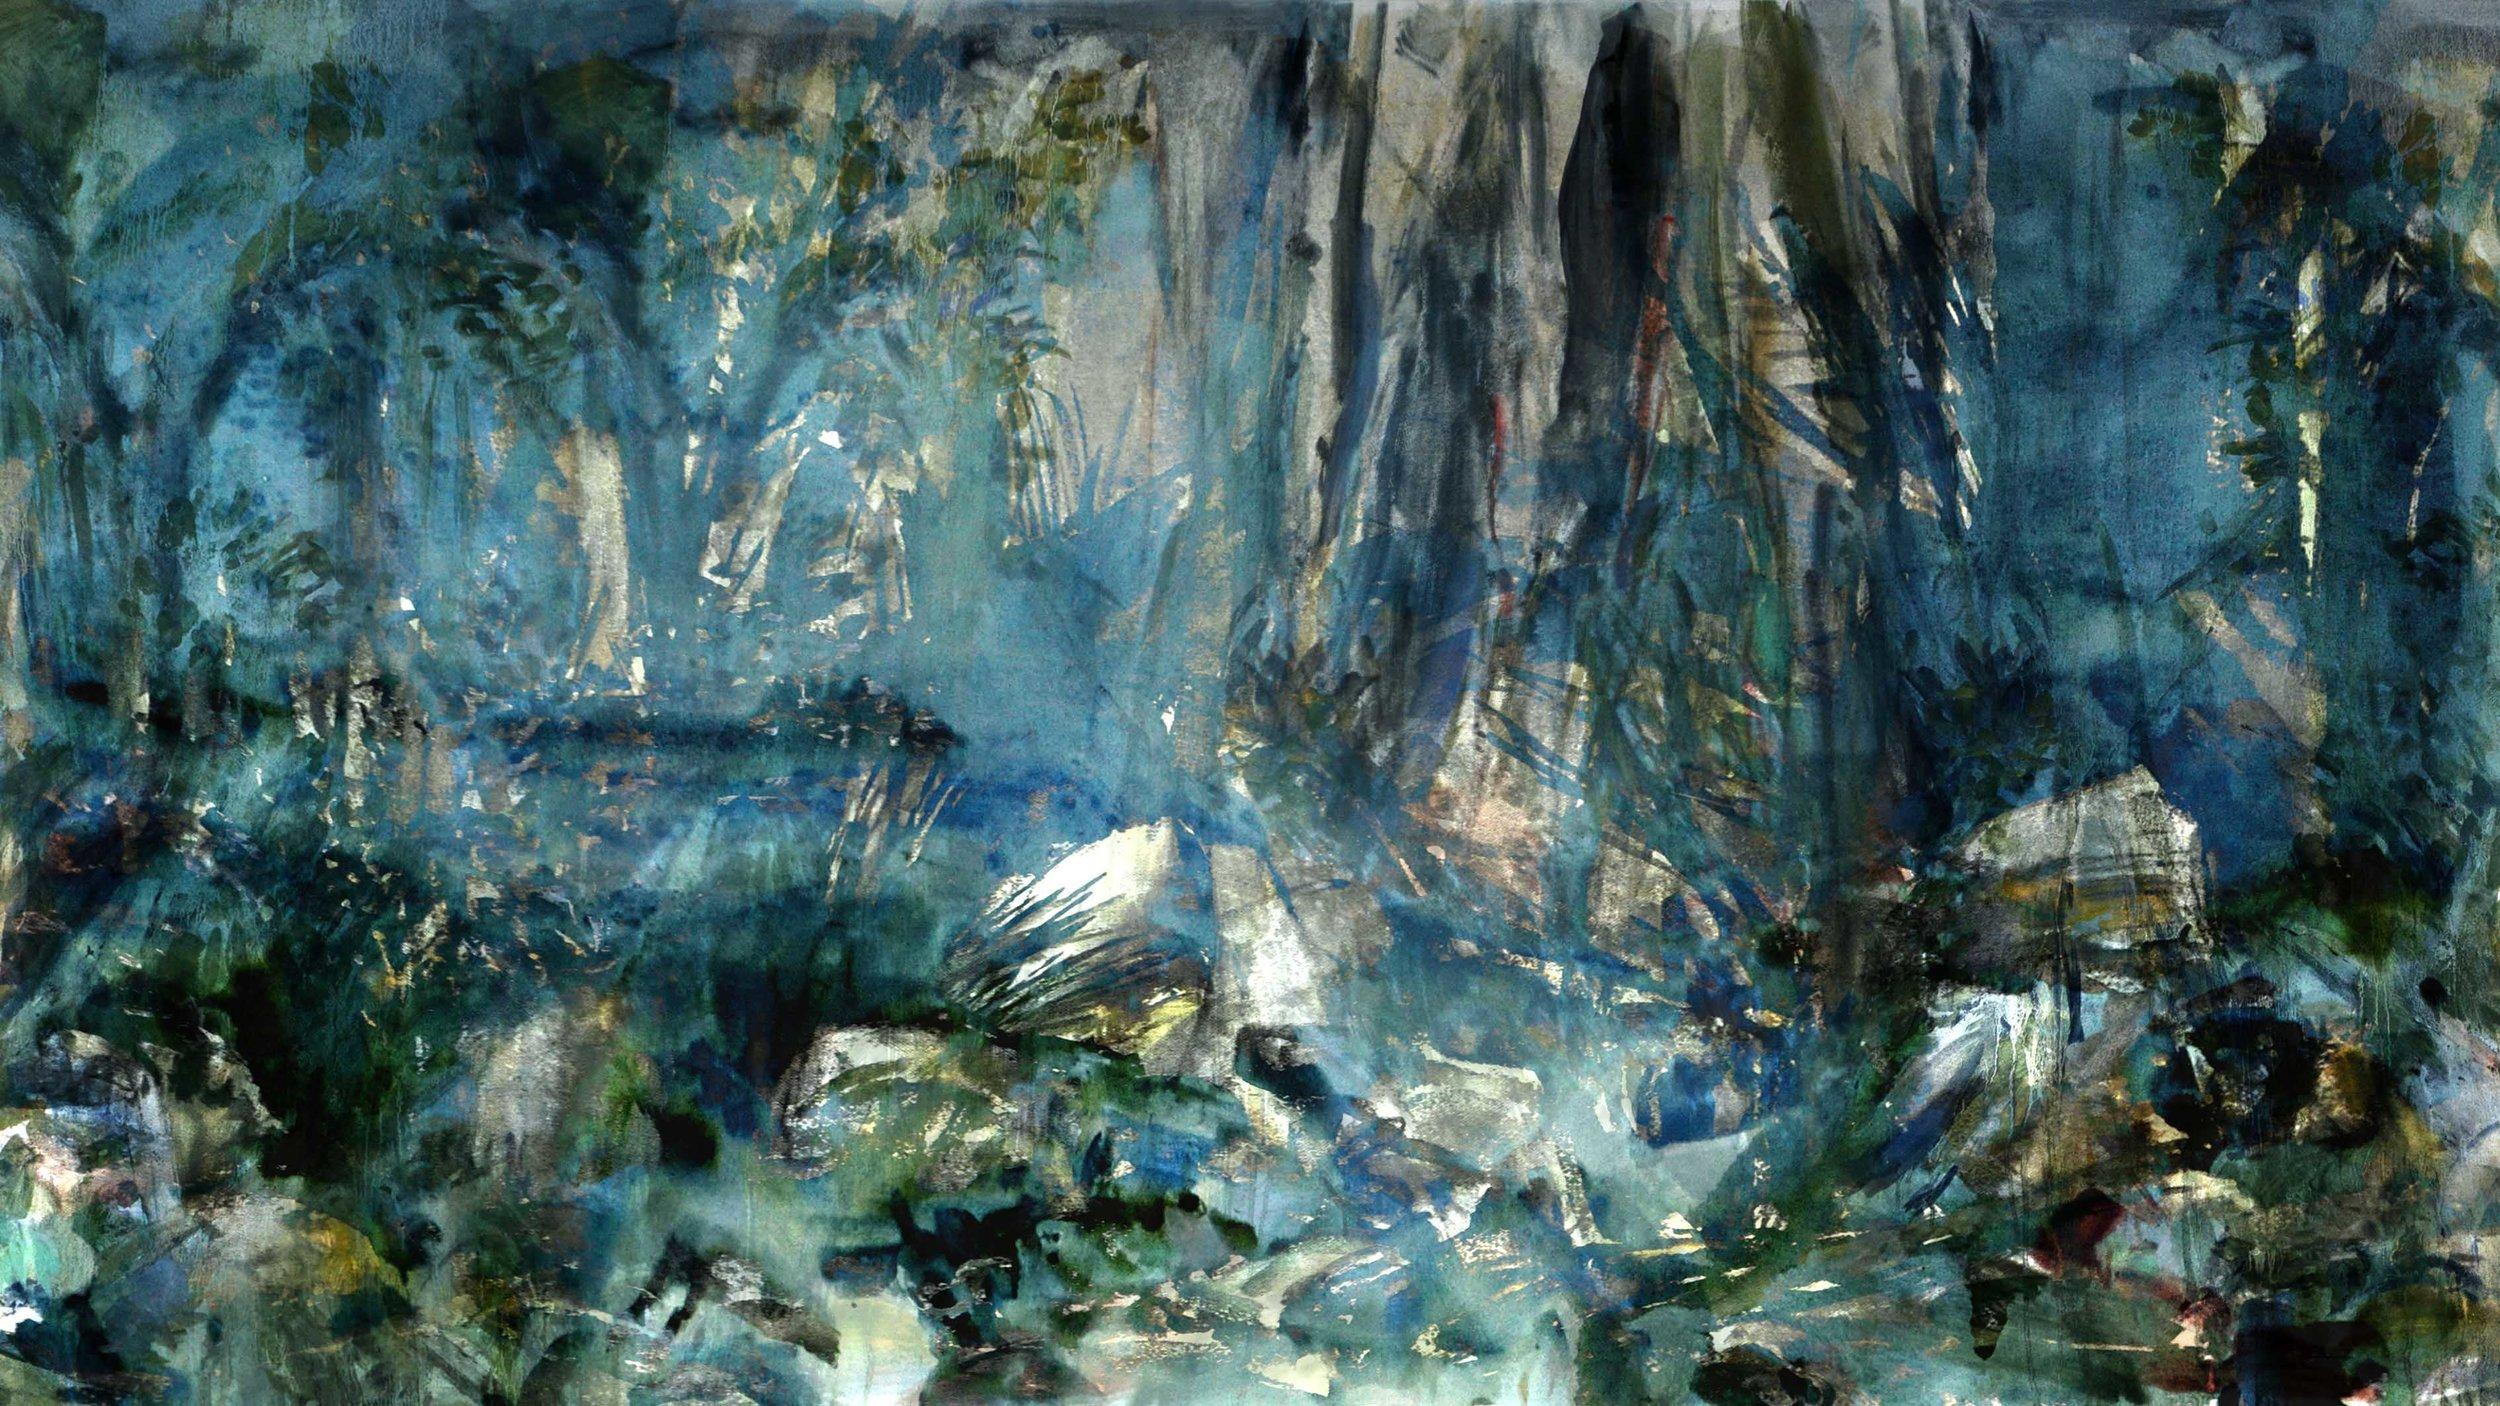 Marais 4, digital painting, dimensions variable, 2016